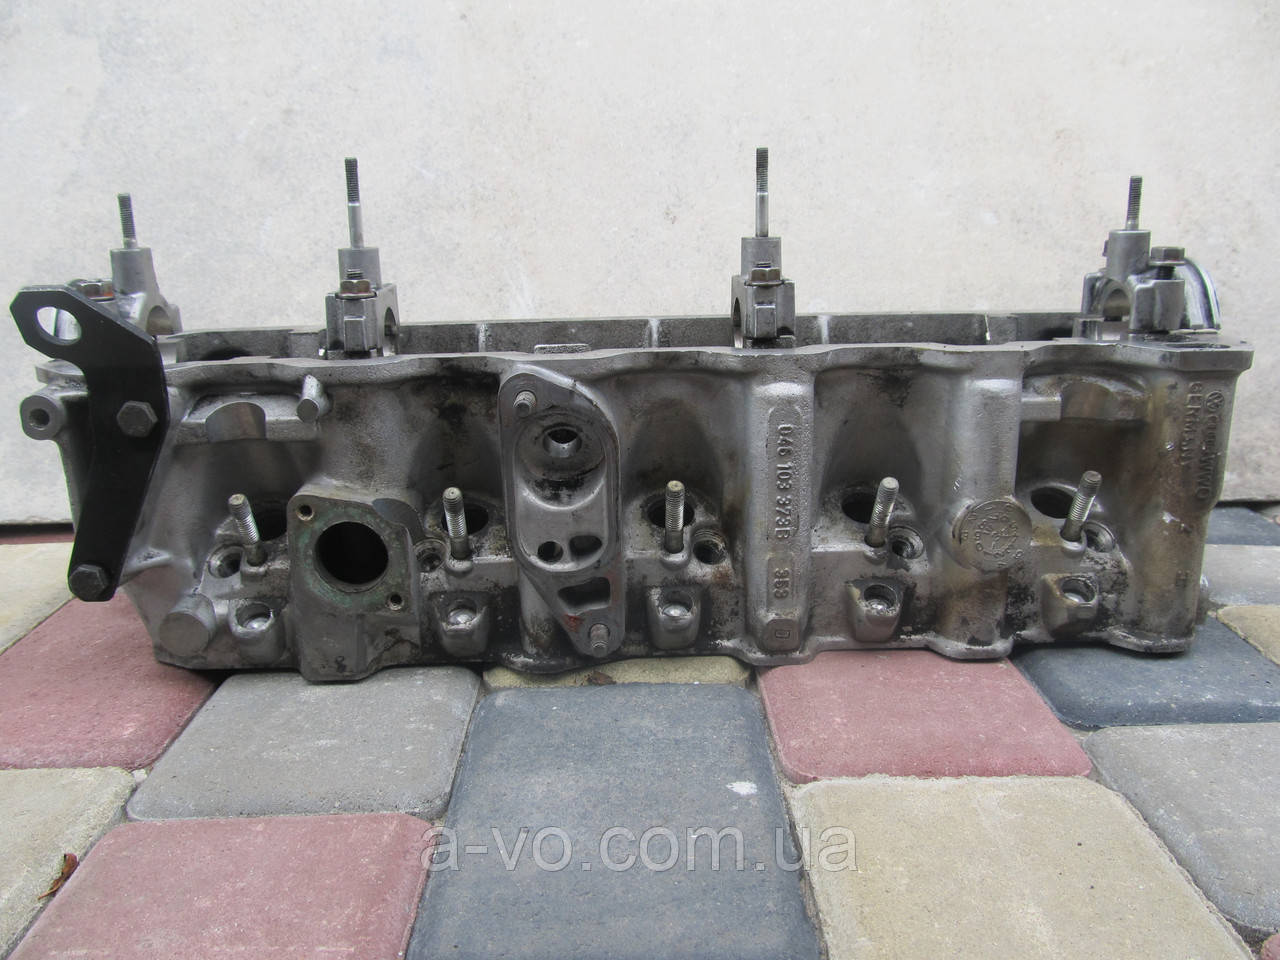 Головка блока цилиндров Audi A6 C4 100 2.5TDi, 046103373B